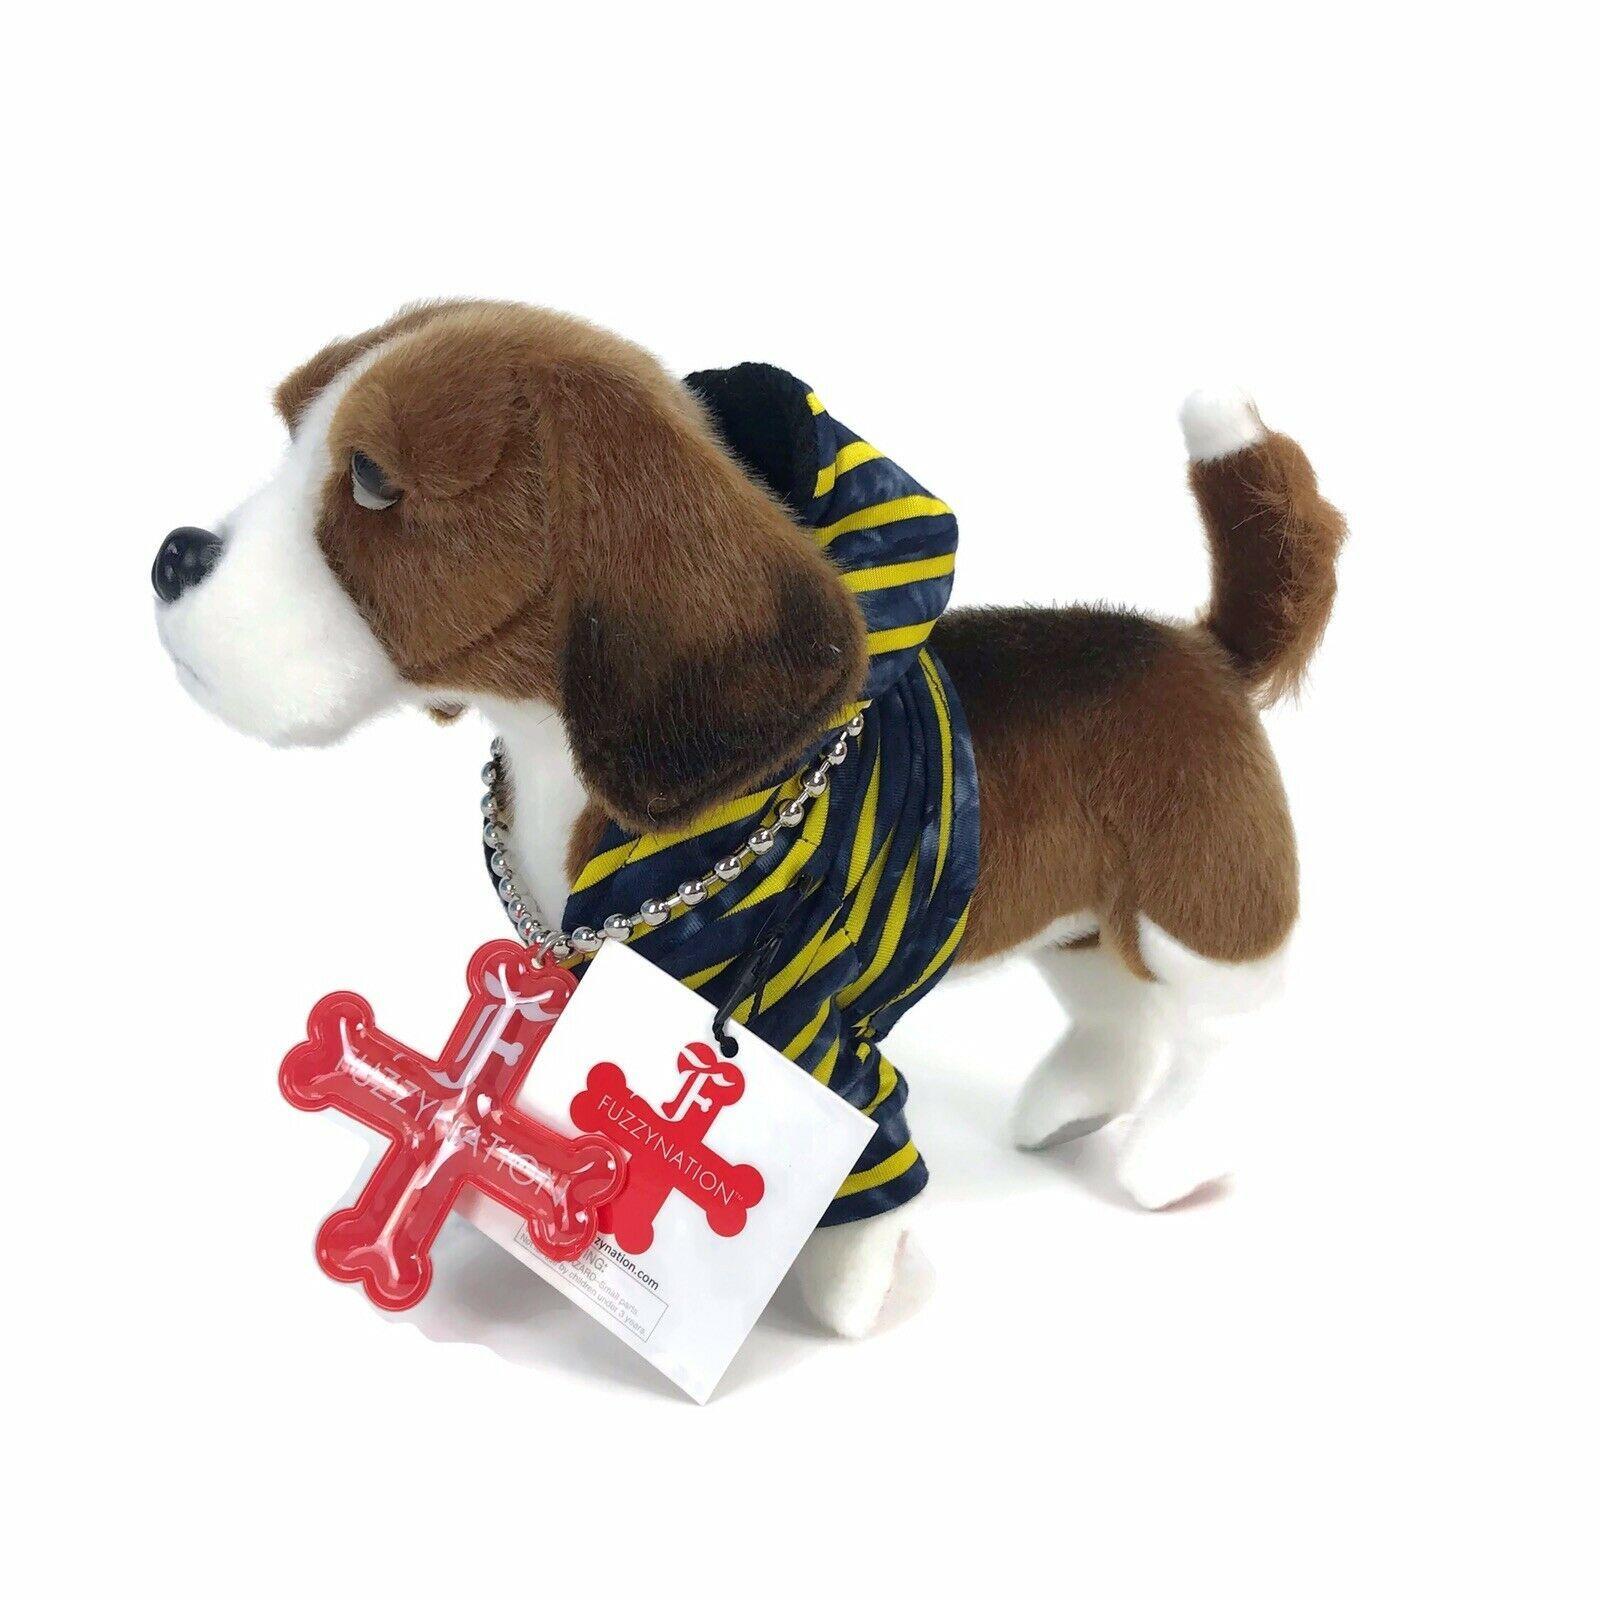 Manhattan Toy Fuzzy Nation Plush Dog Atticus Beagle Dressed Plush Stuffed Animal - $14.45